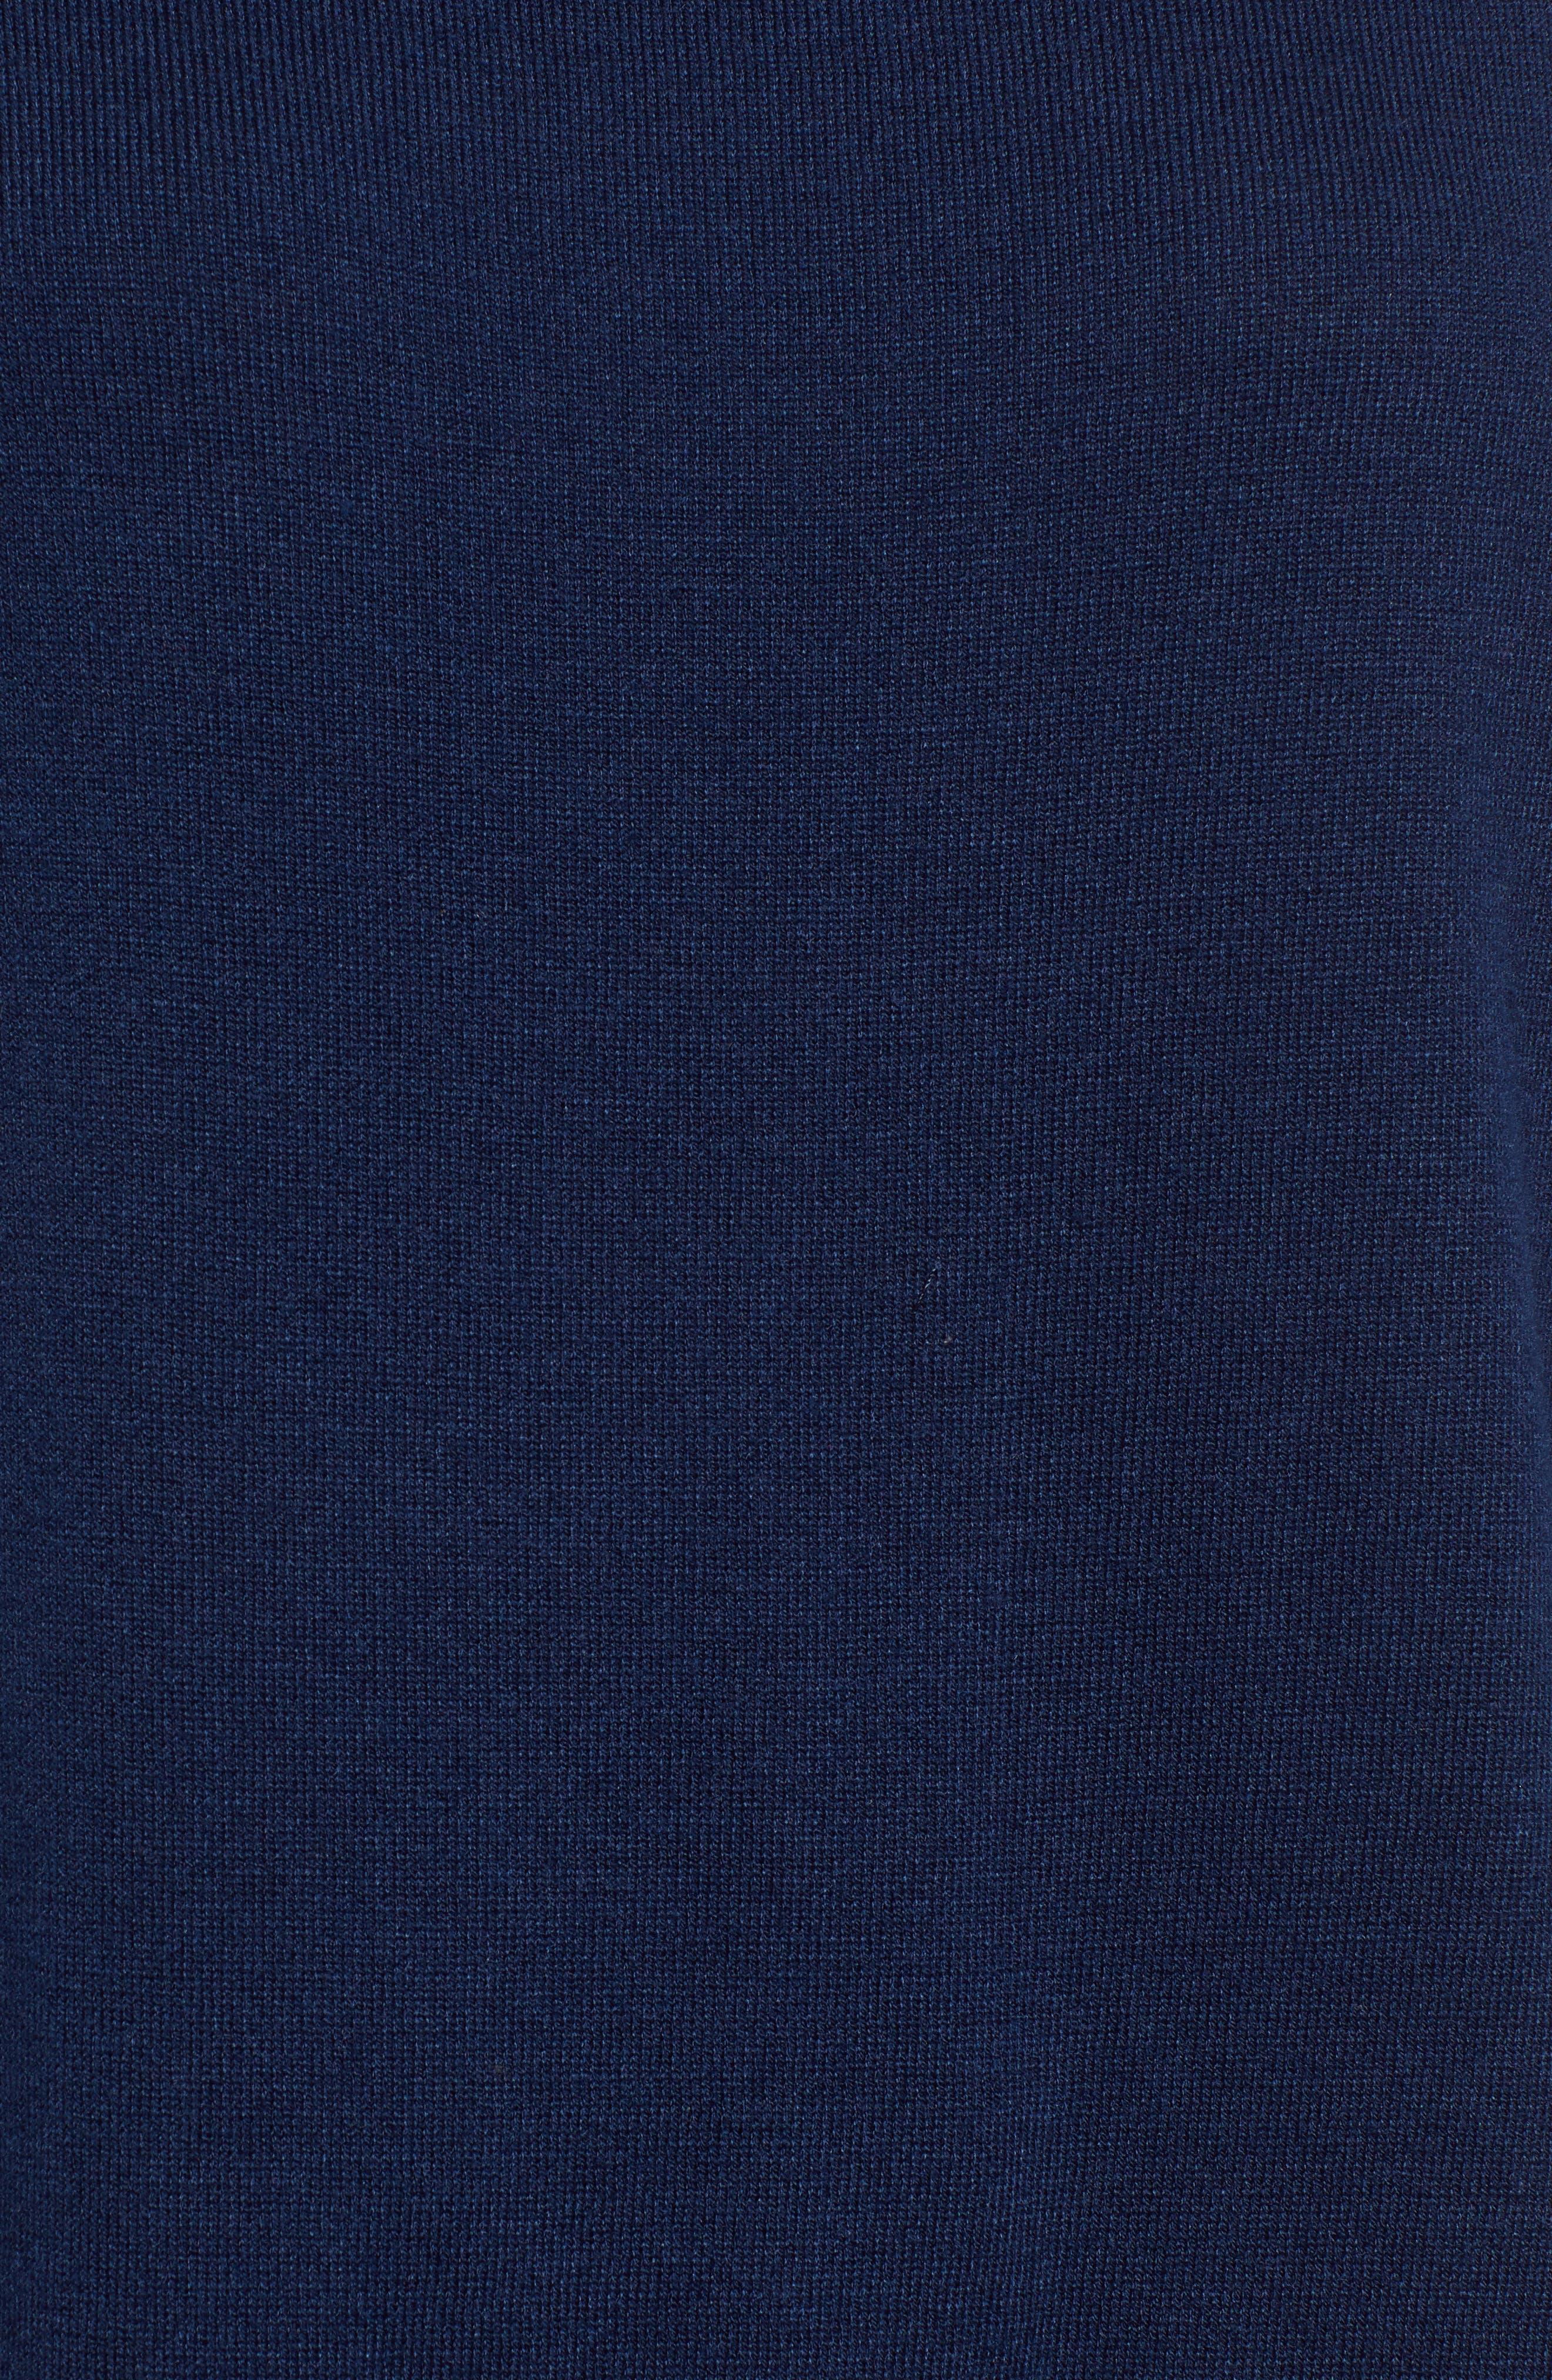 Back Zip Crewneck Sweater,                             Alternate thumbnail 5, color,                             476